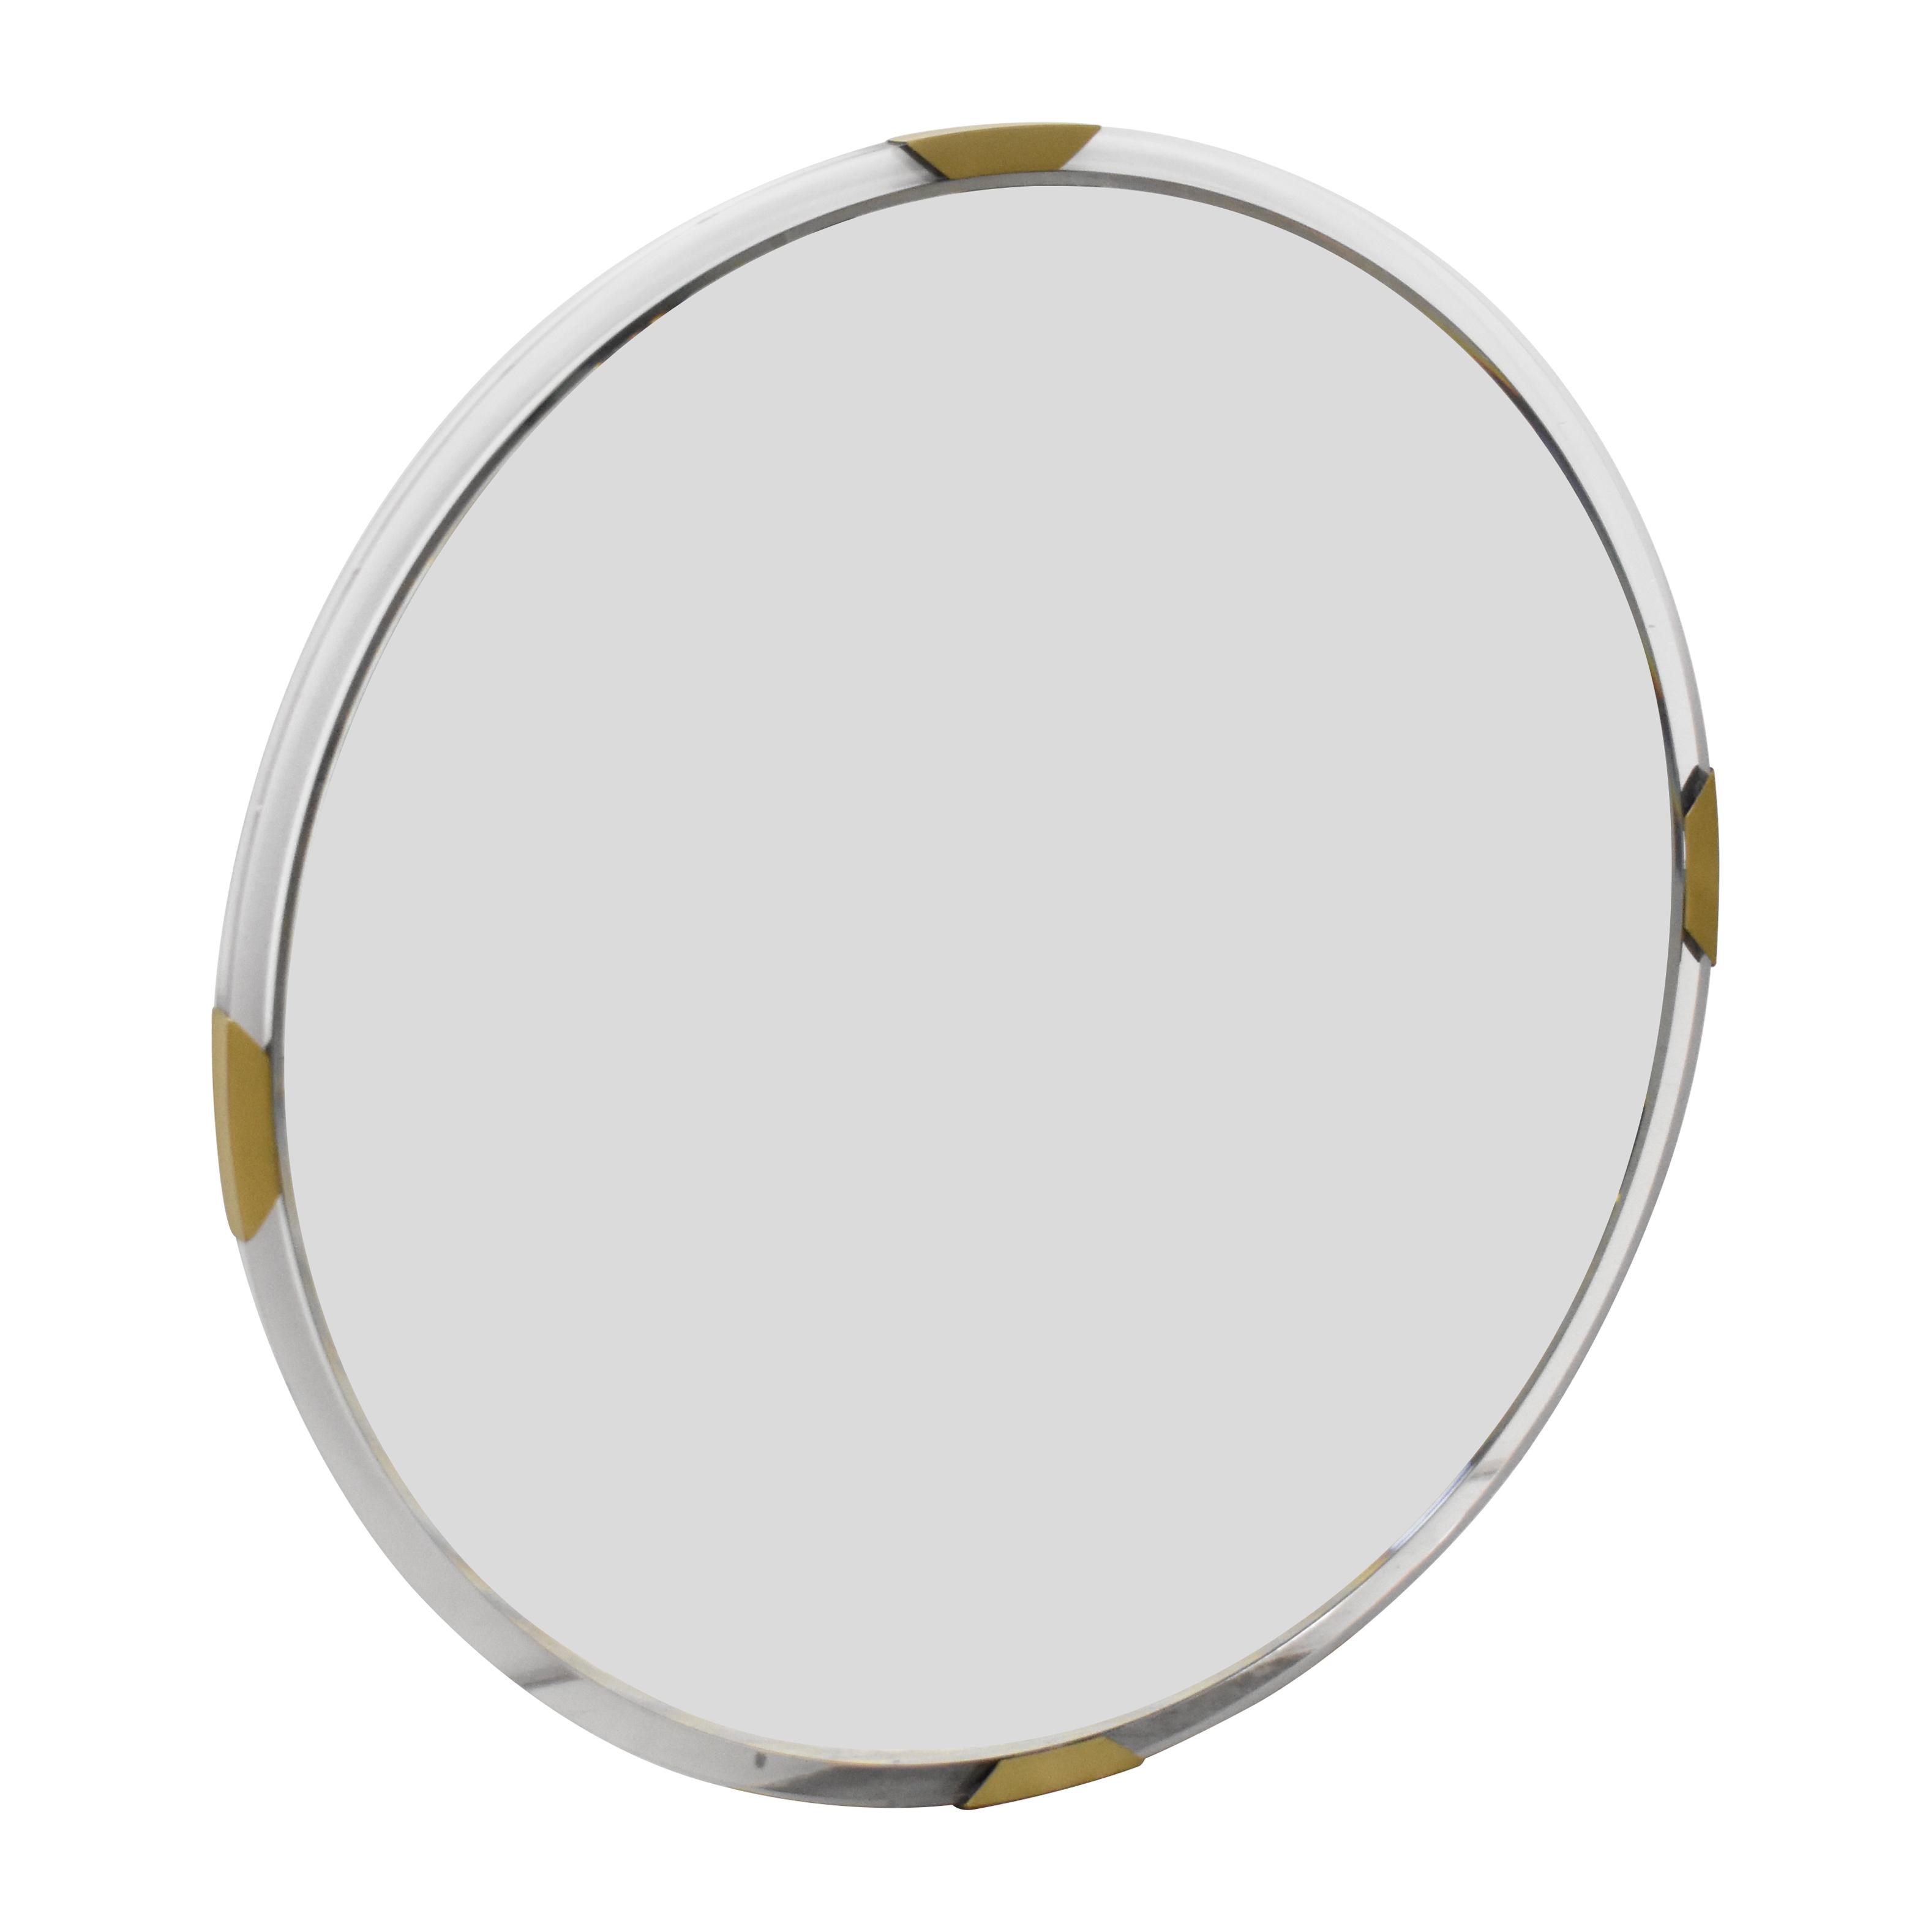 buy CB2 Demi Acrylic Round Mirror CB2 Decor